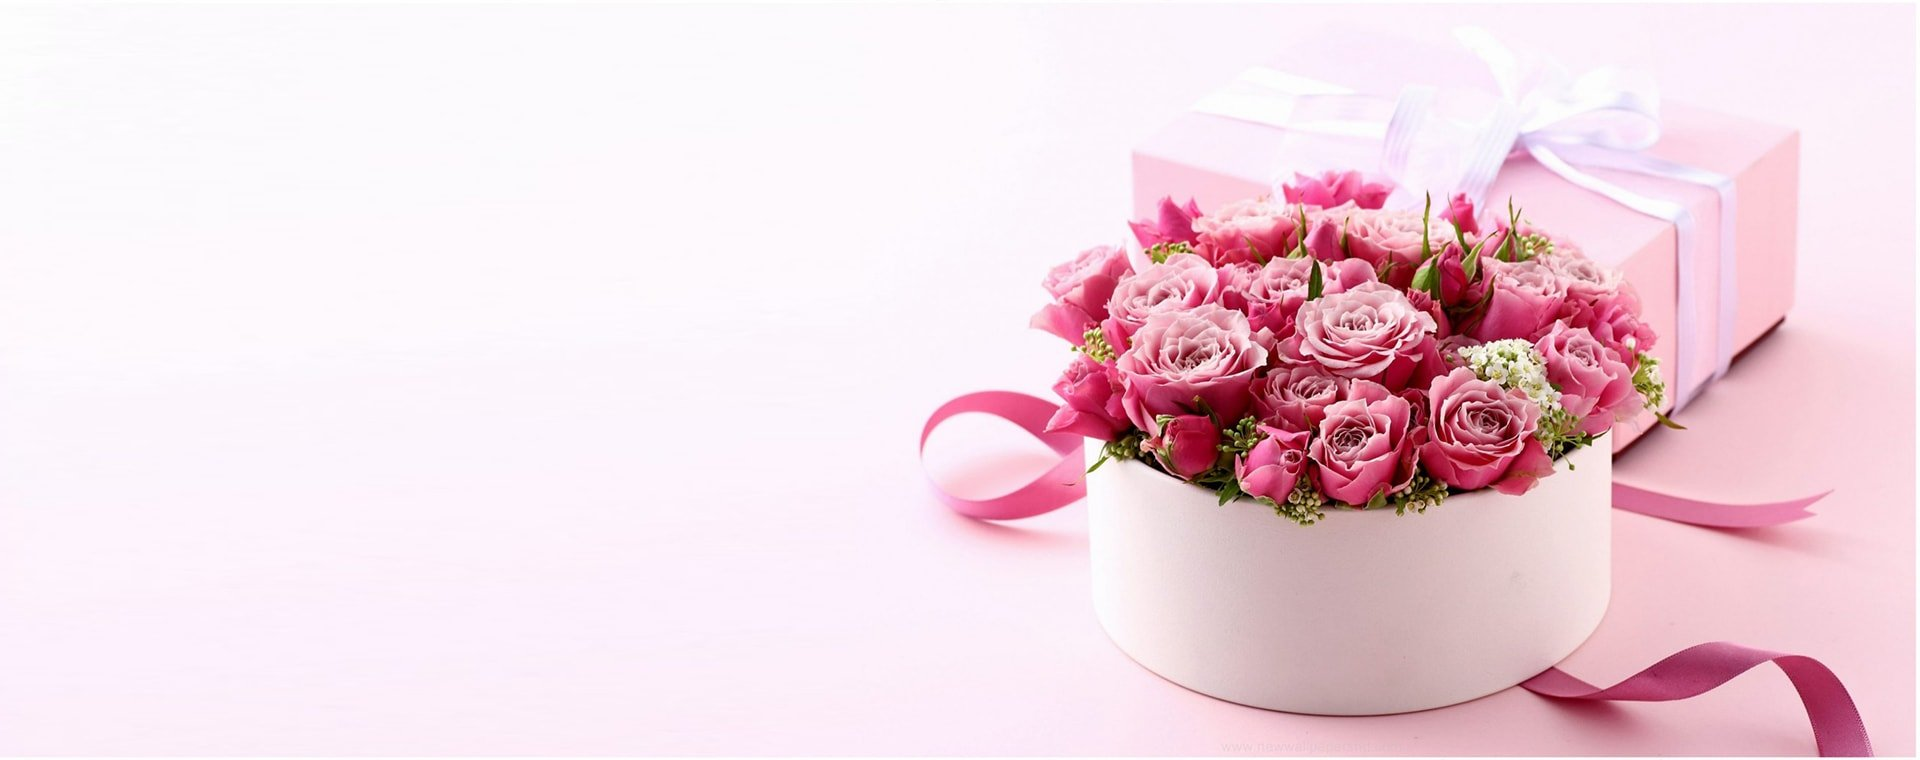 фото цветочная корзина